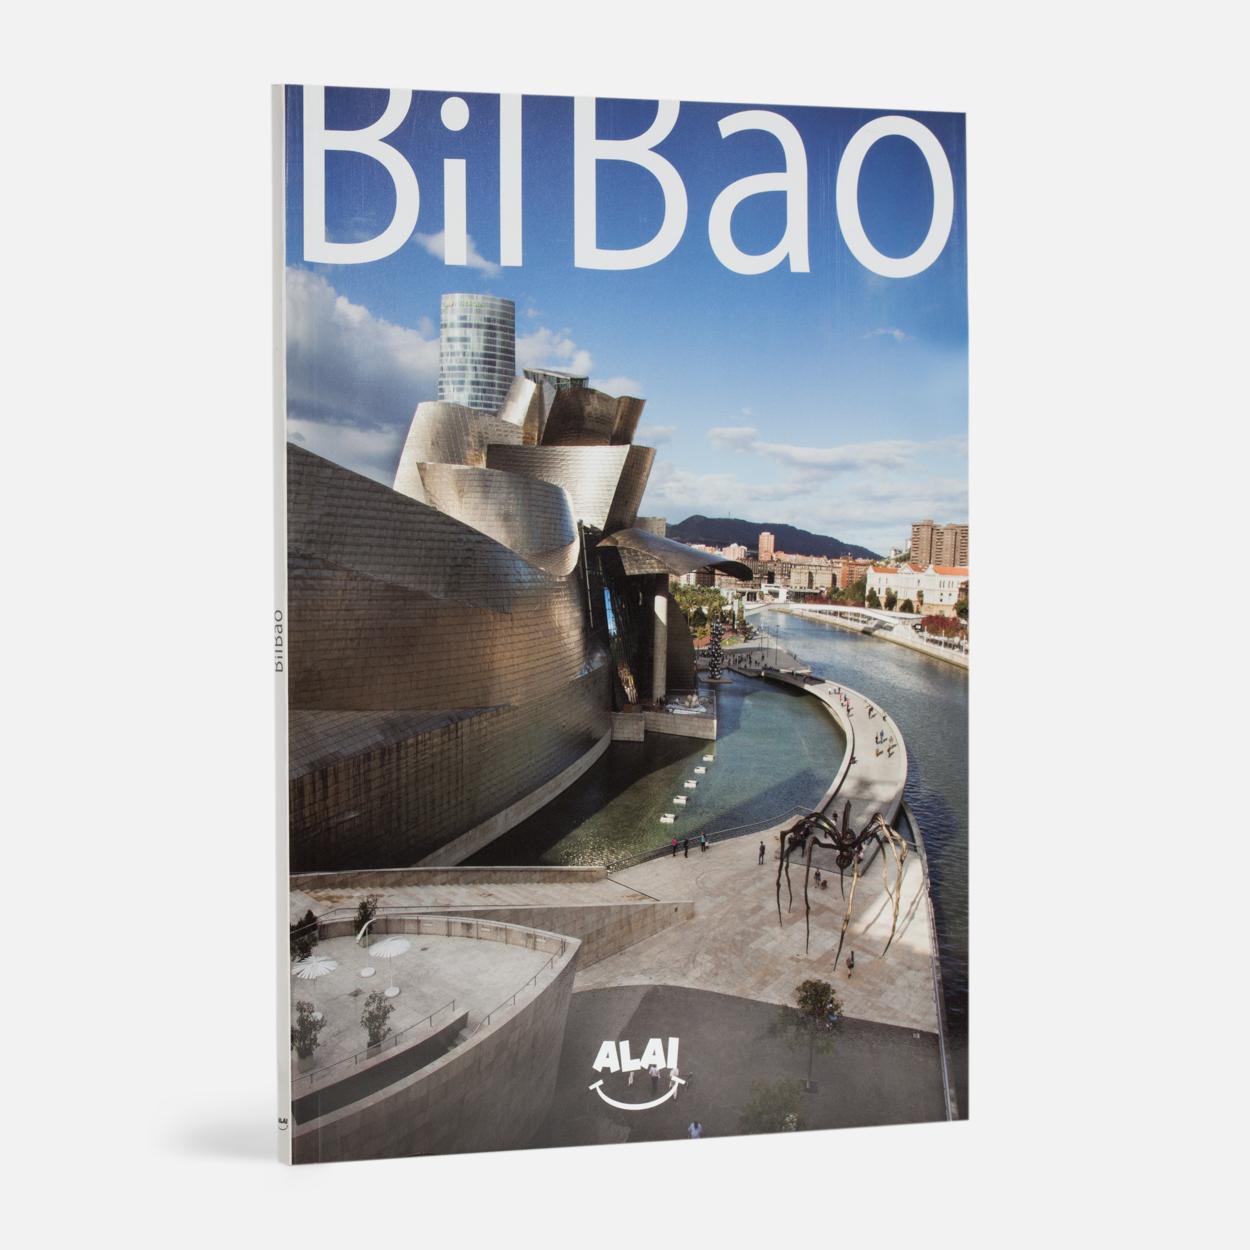 Bilbao remembers